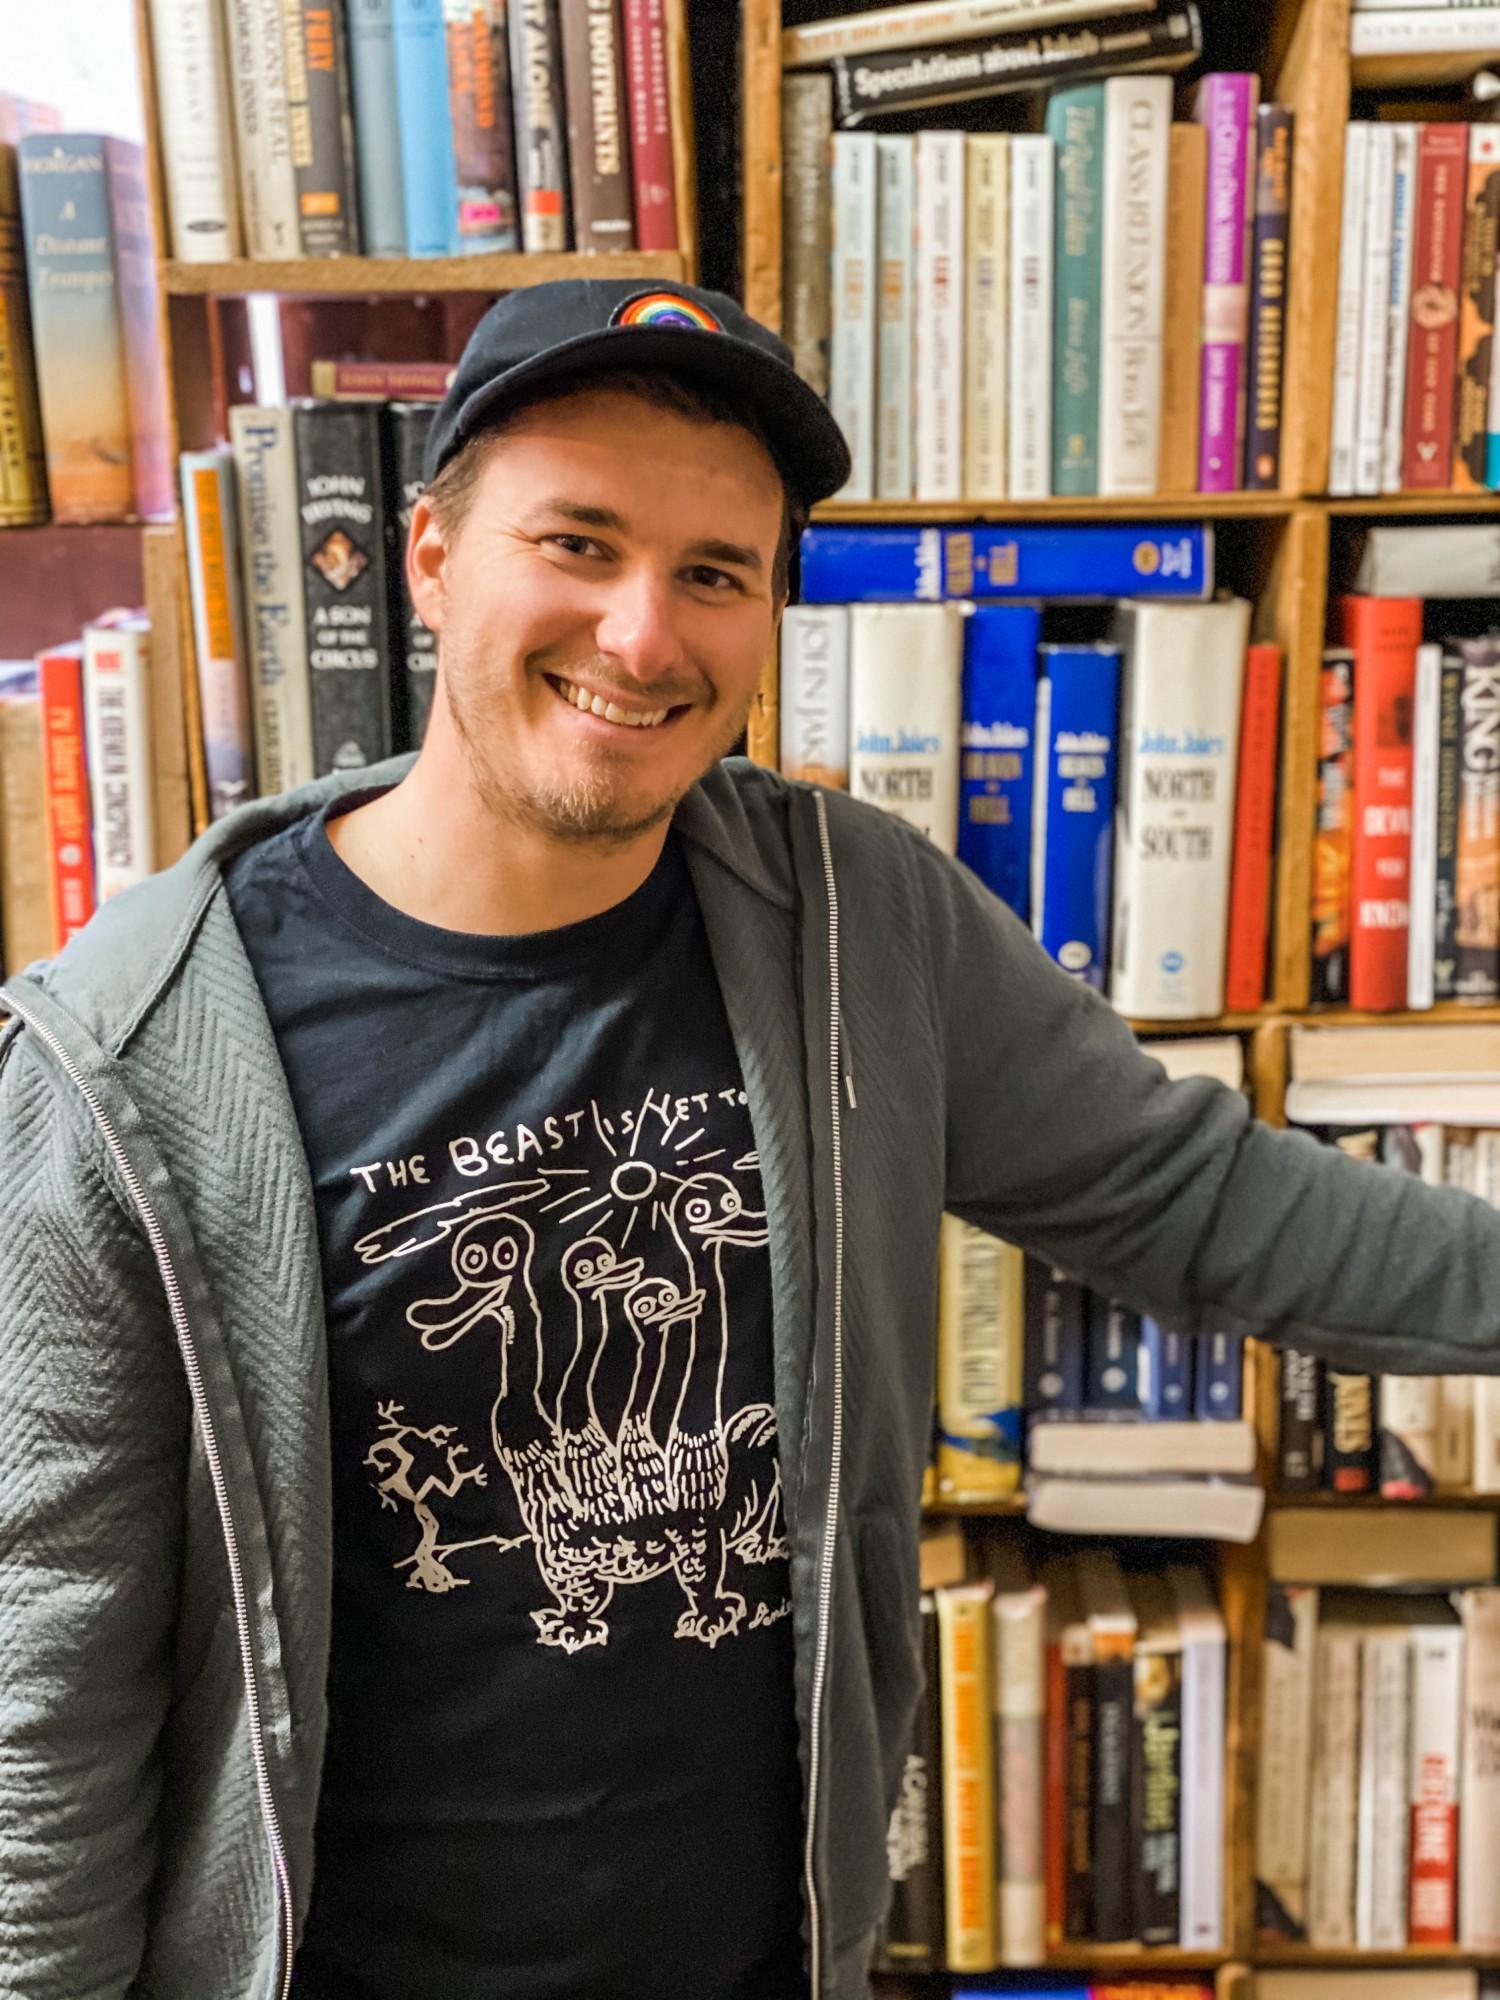 Adam Gianforcaro